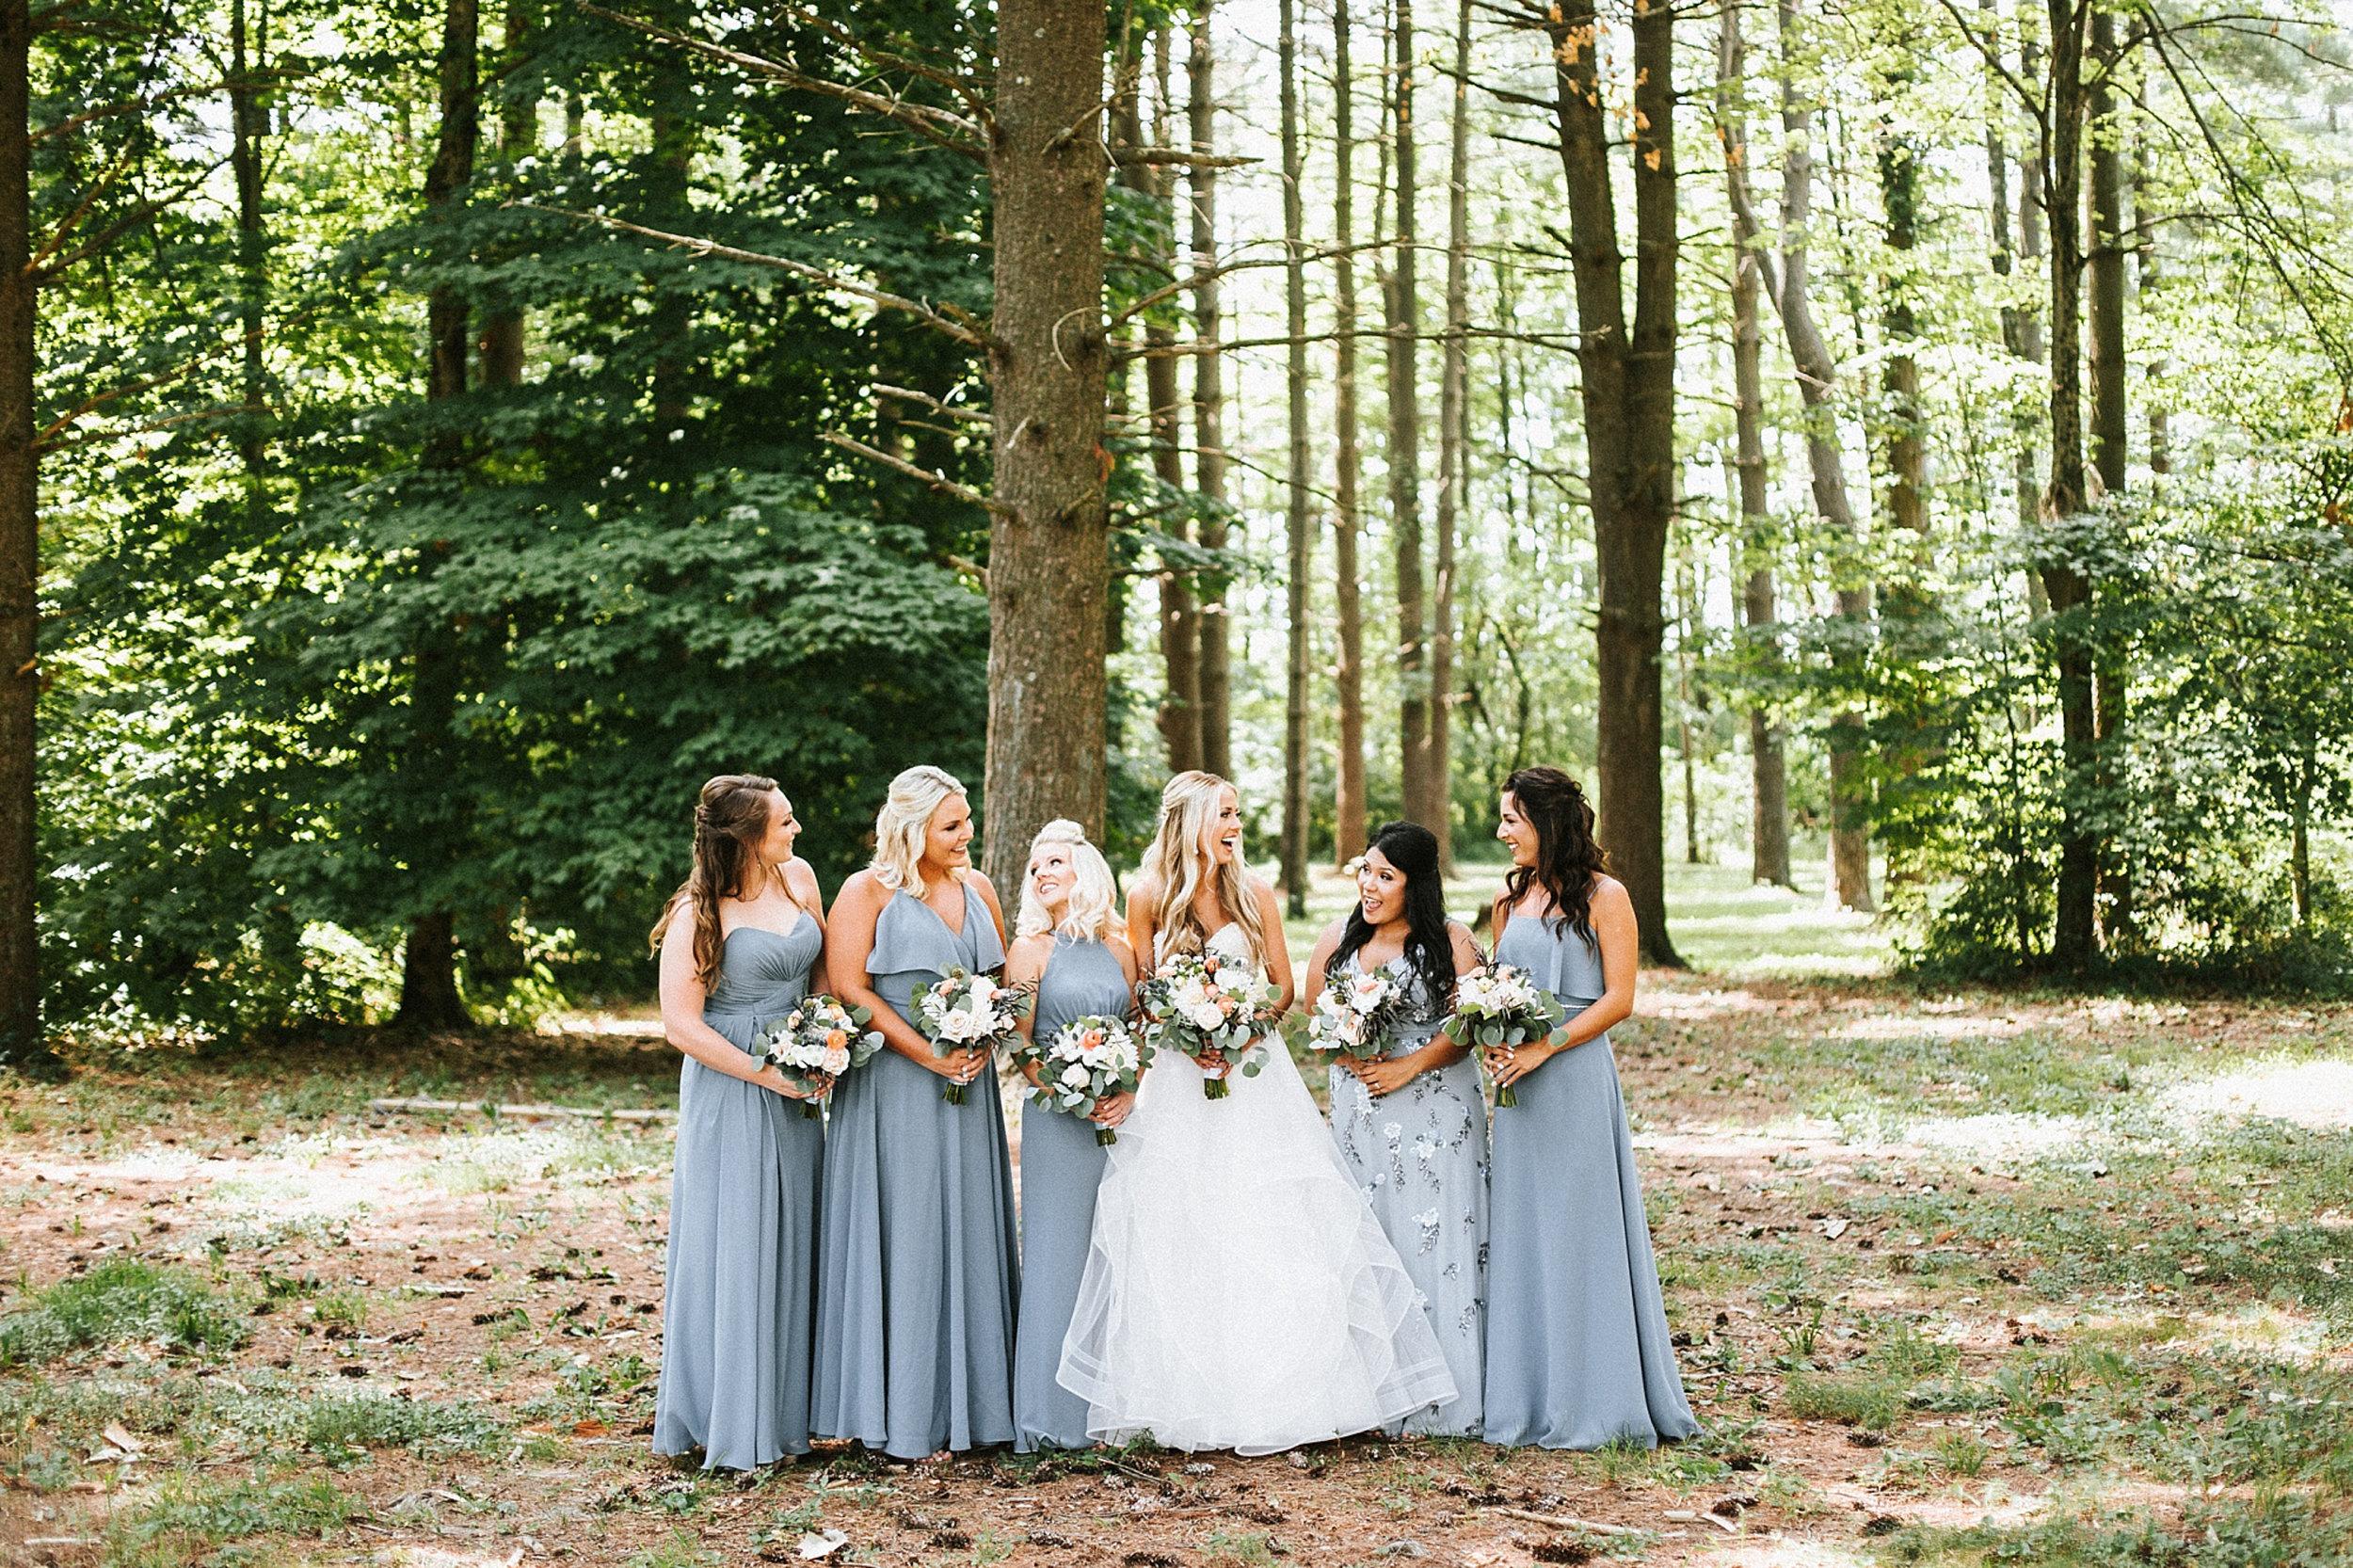 Brooke Townsend Photography - Cincinnati Wedding Photographer (14 of 153).jpg